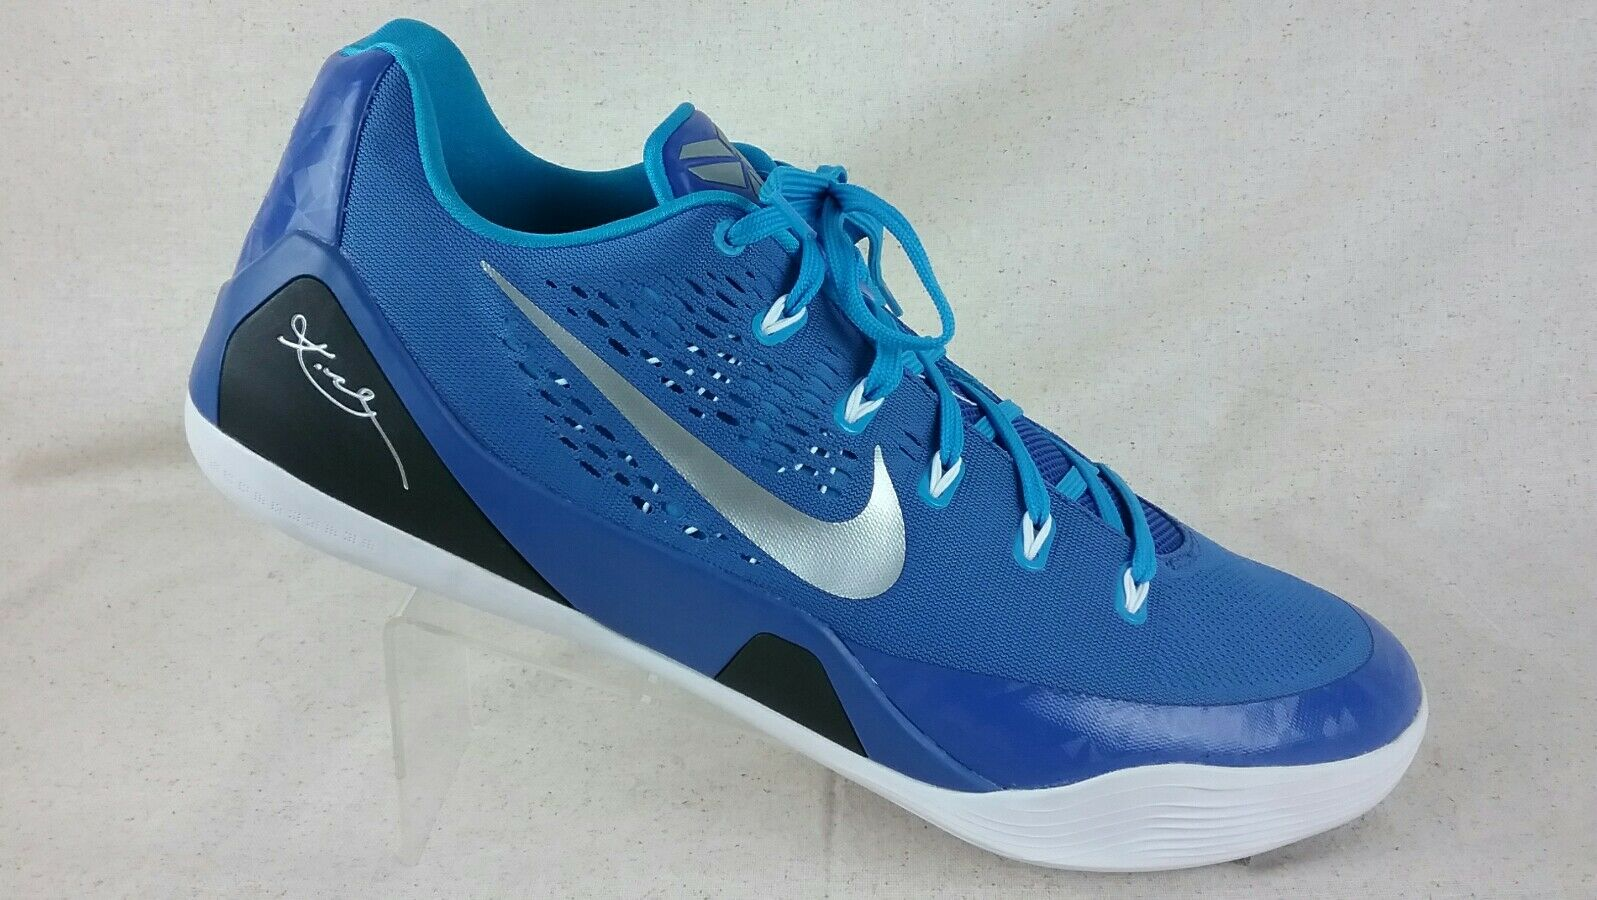 Nike kobe niedrigen em tb - spiel bei 16,5 16,5 16,5 royal bl / metallic - silber / Weiß 685776-405 893aac